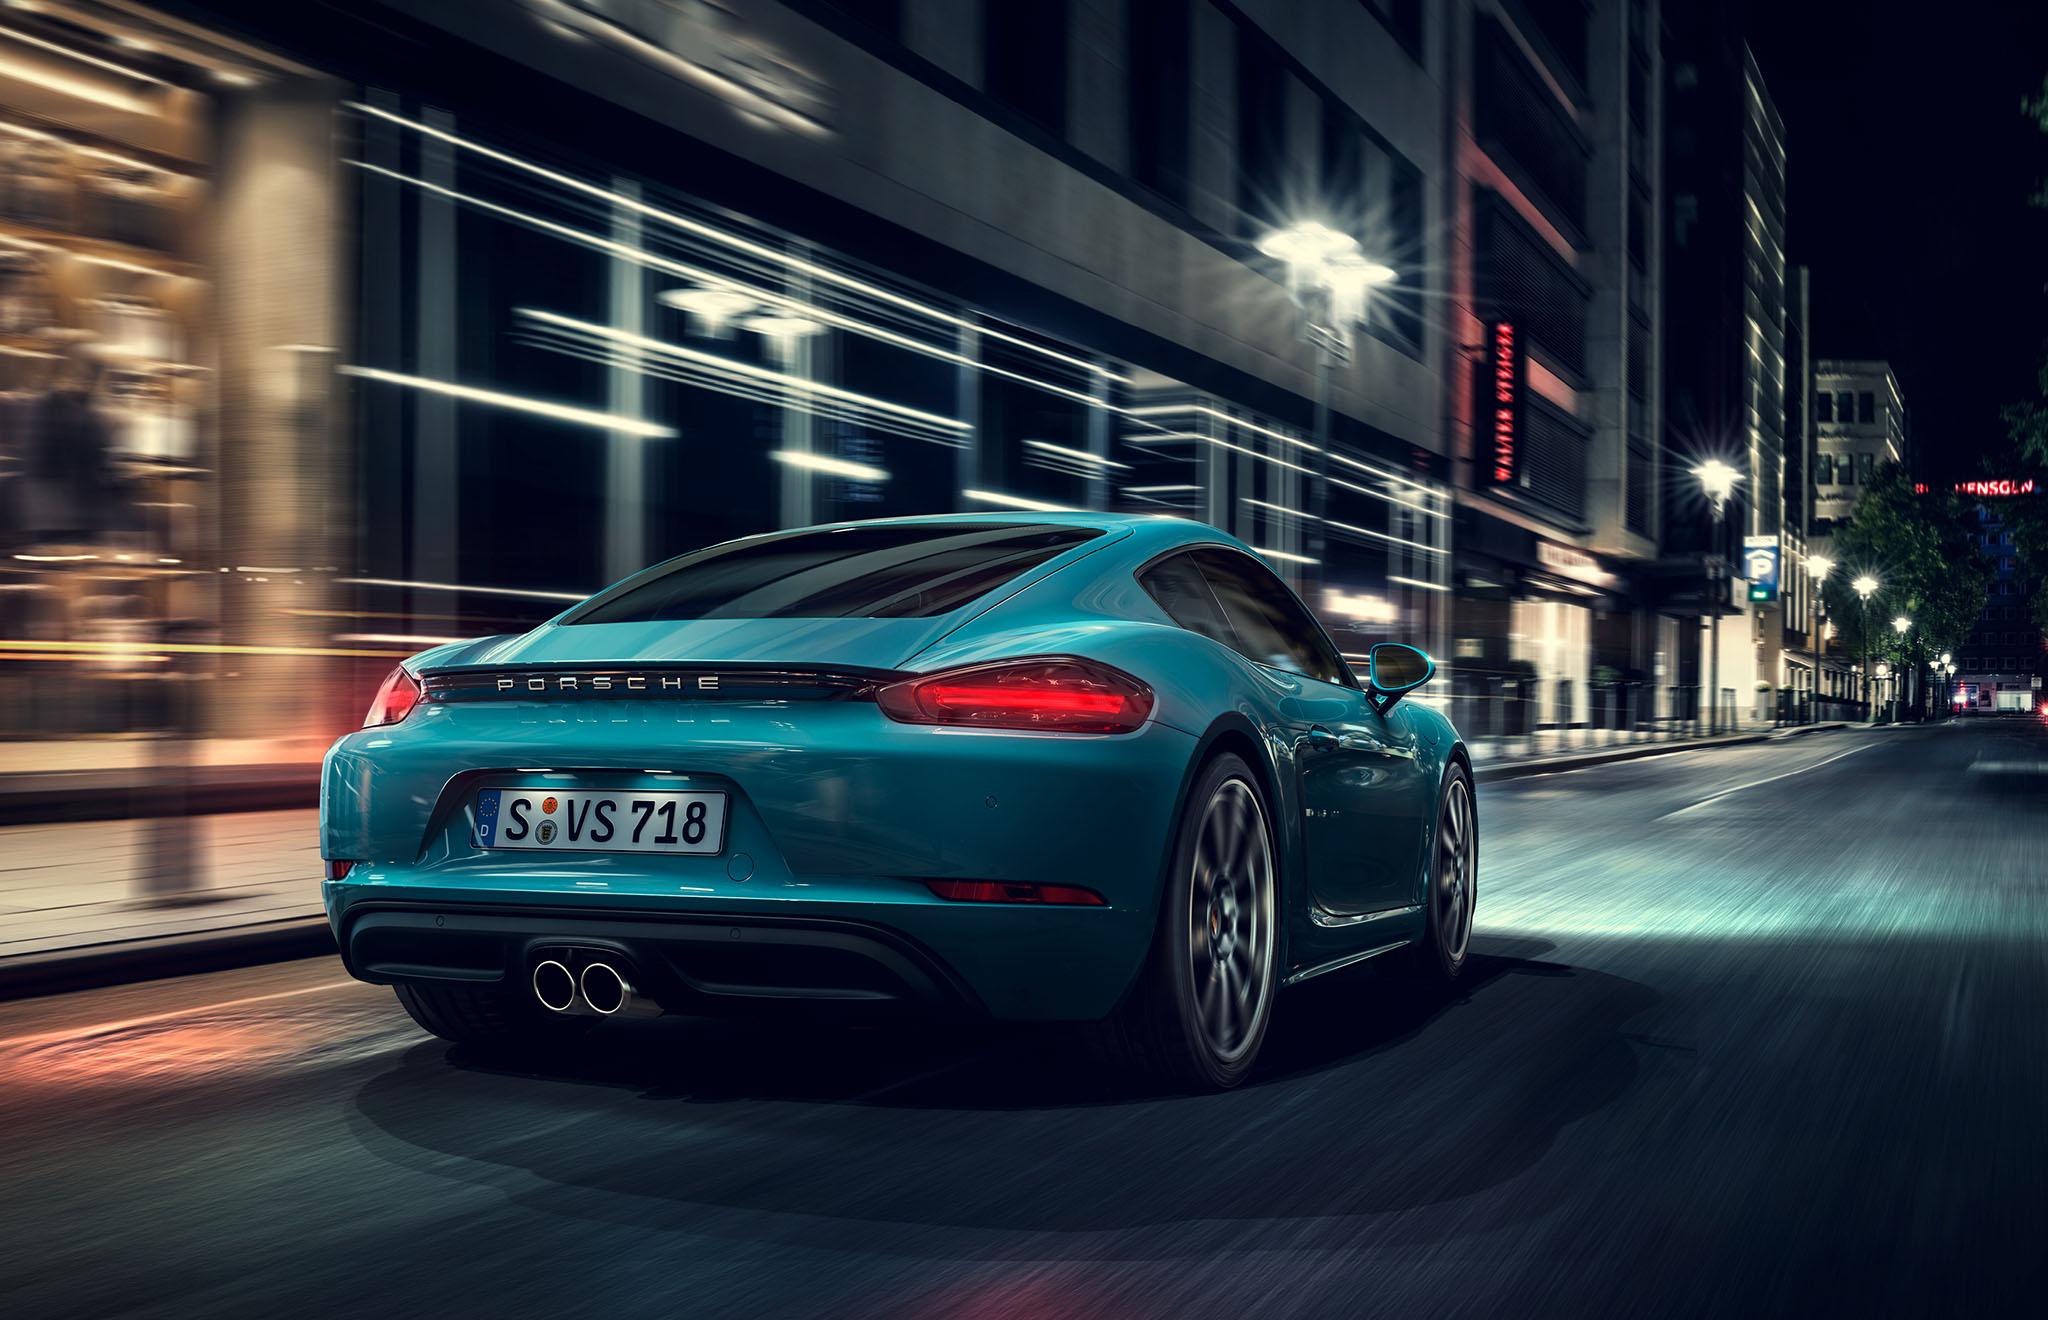 Porsche Cayman at night